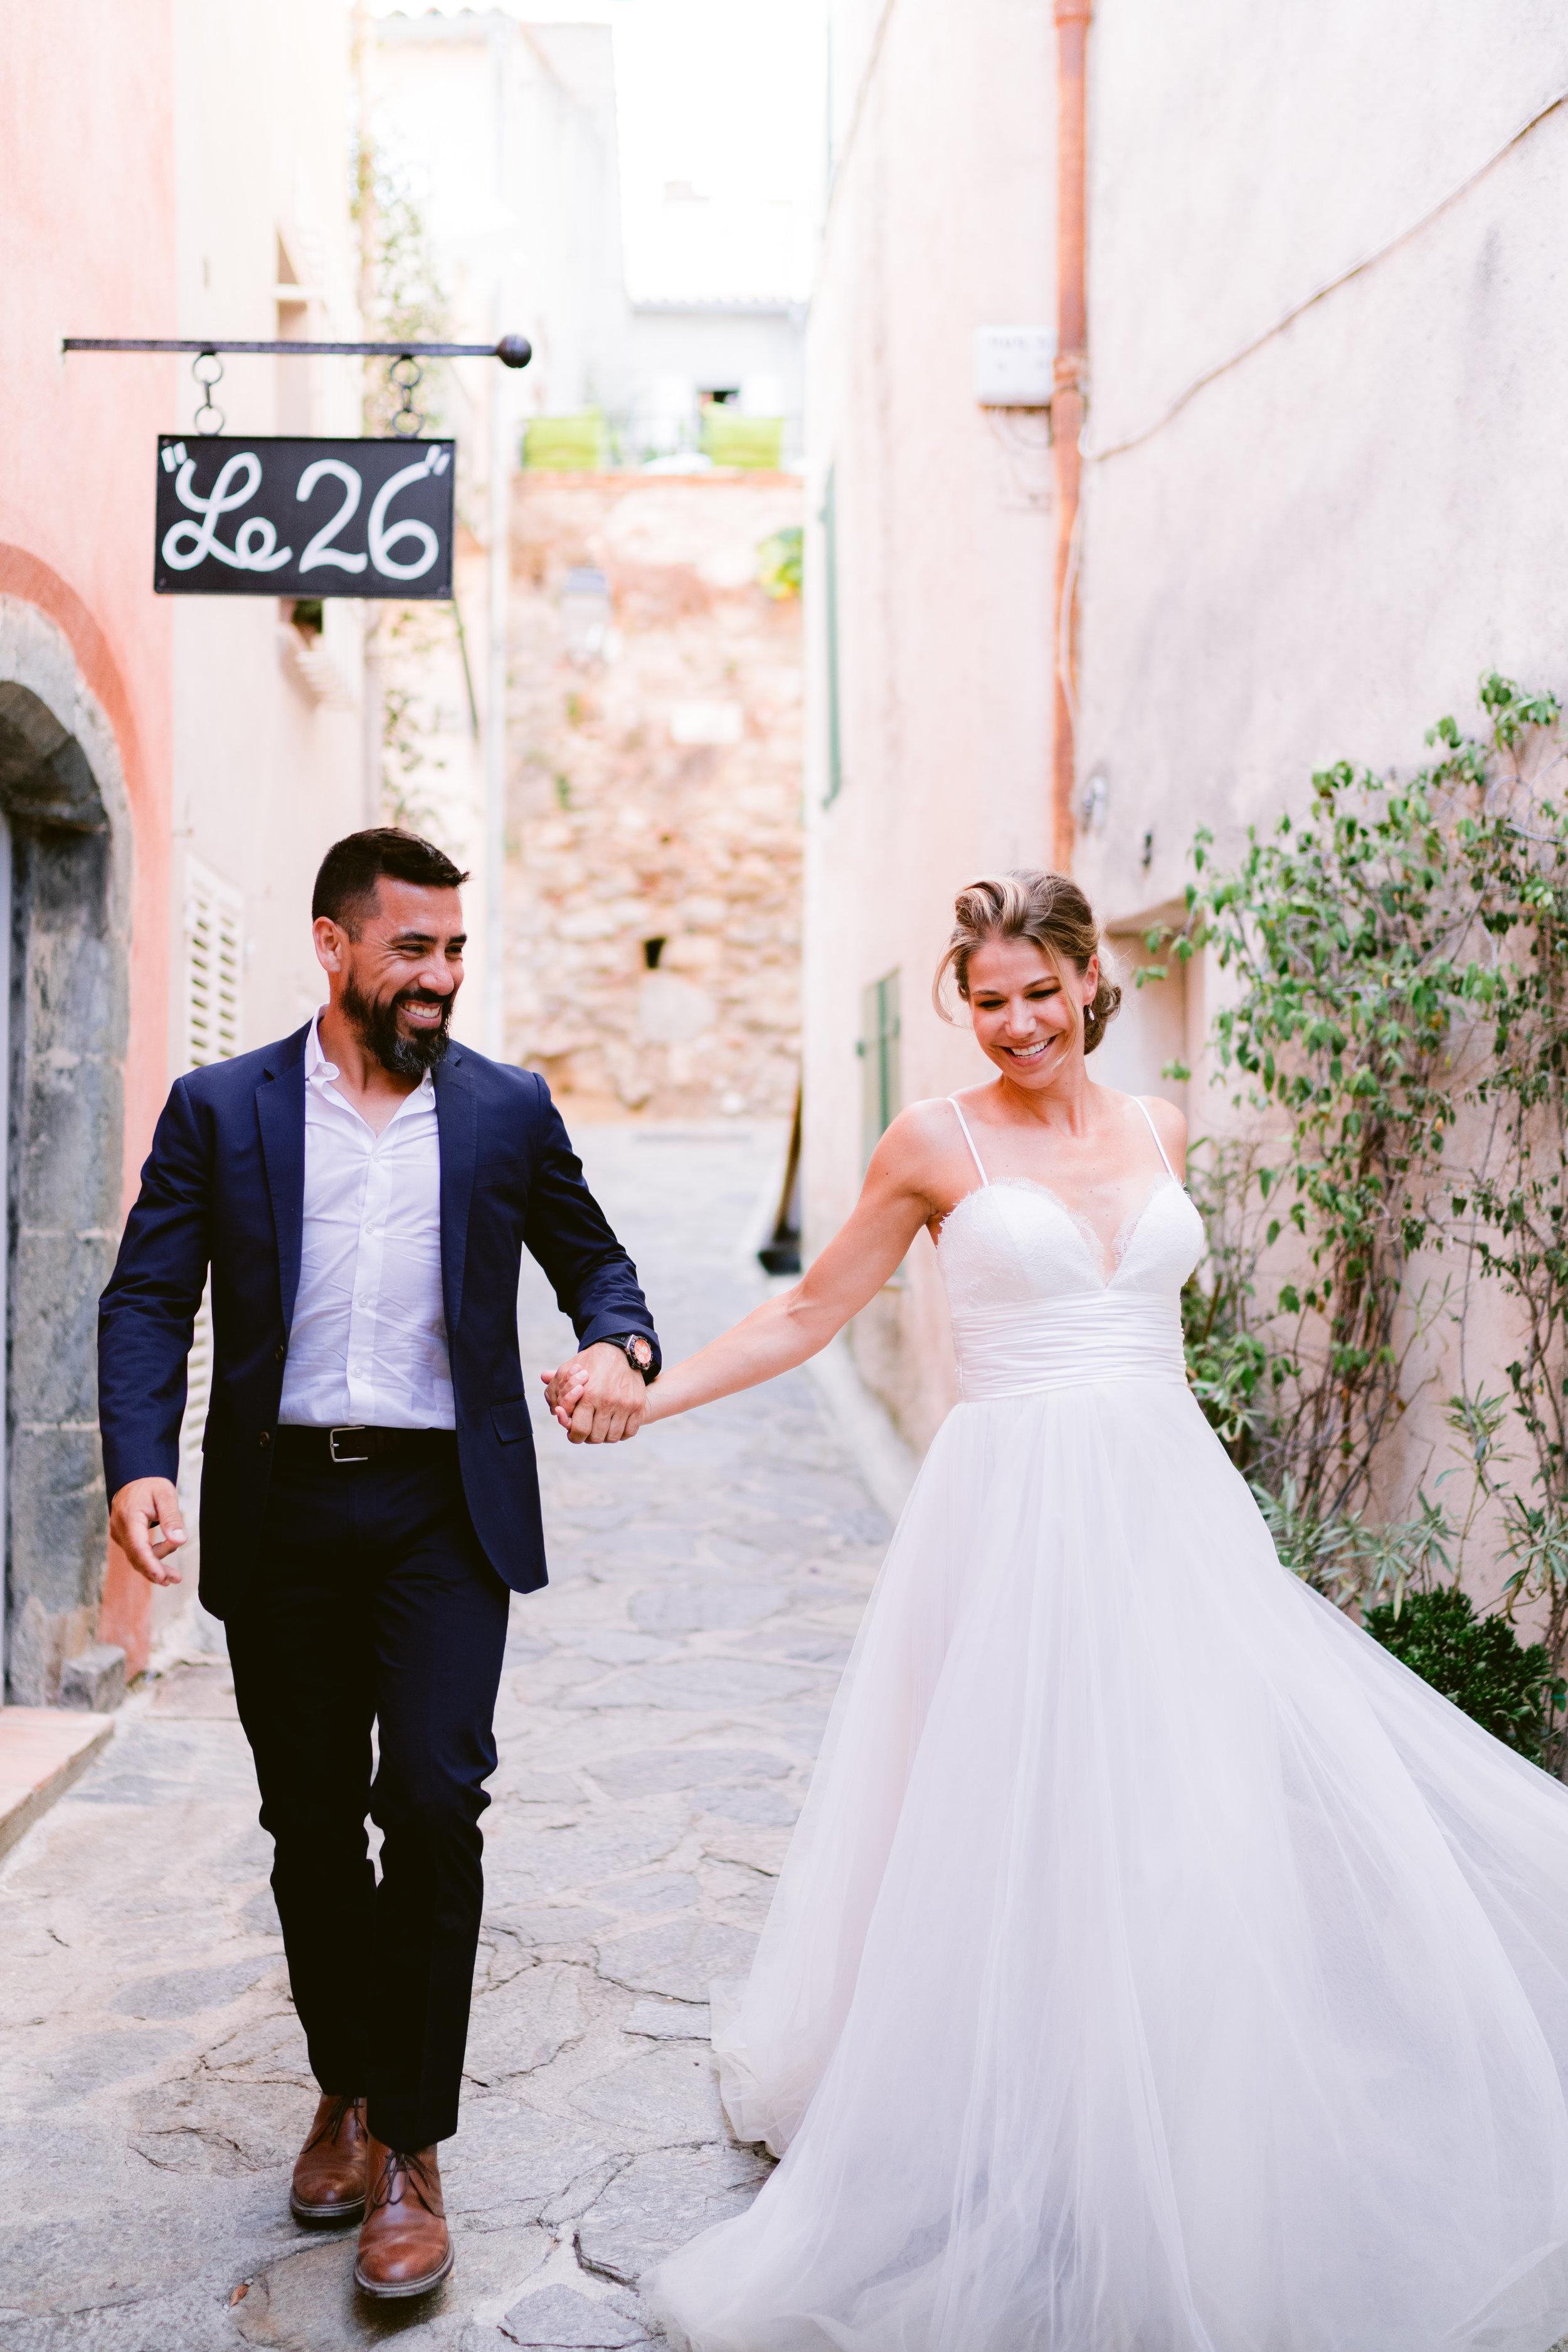 english photographer in france, wedding photographer saint tropez, romantic wedding photography france, chateau wedding france, cote d'azur wedding photographer, ramatuelle wedding (13).jpg